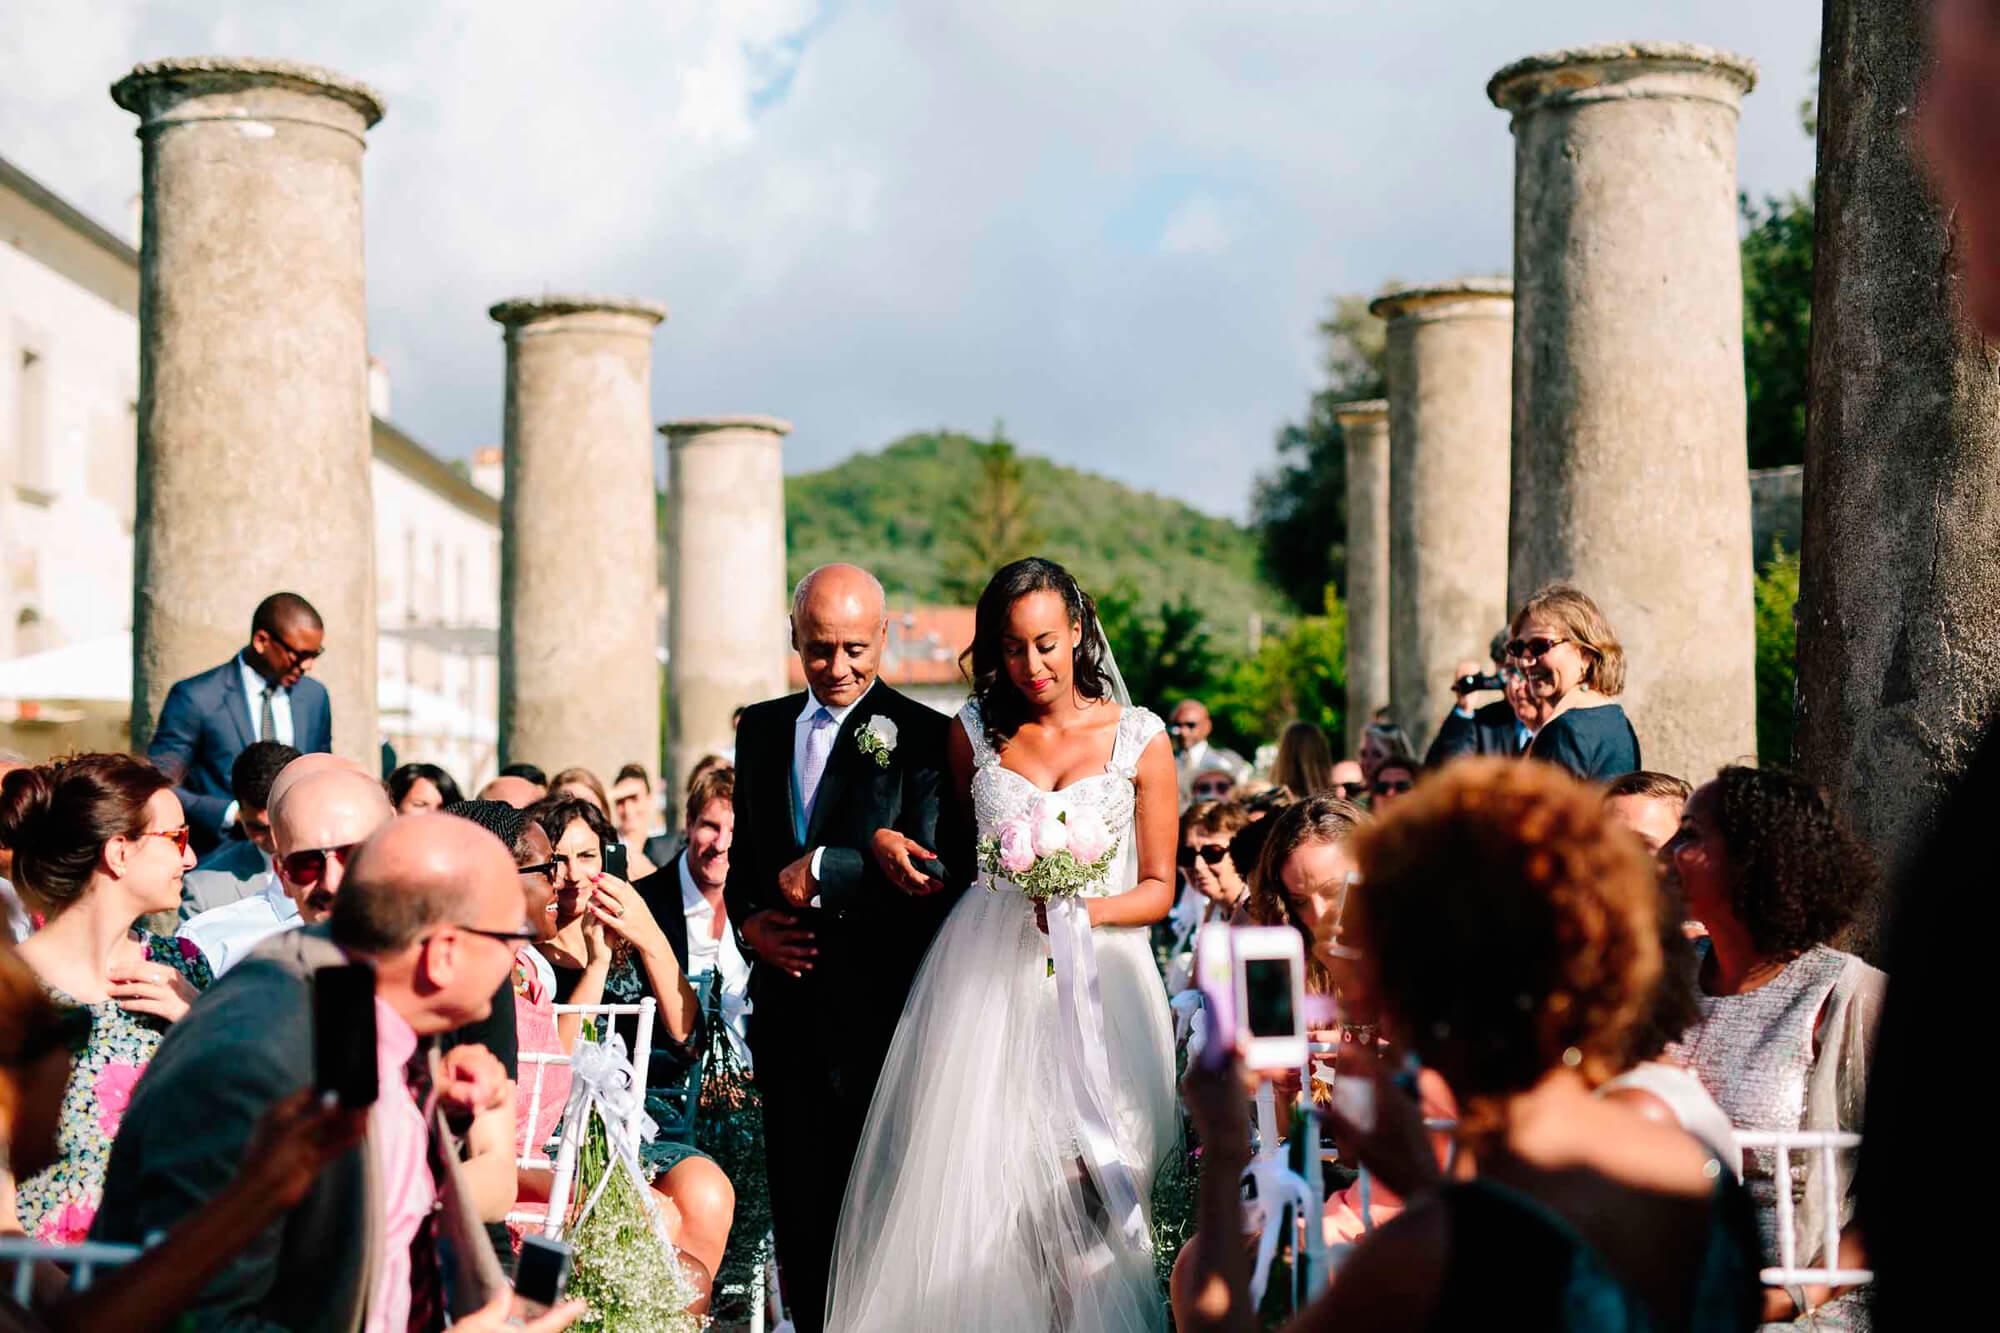 057-sorrento-wedding-photographer.jpg